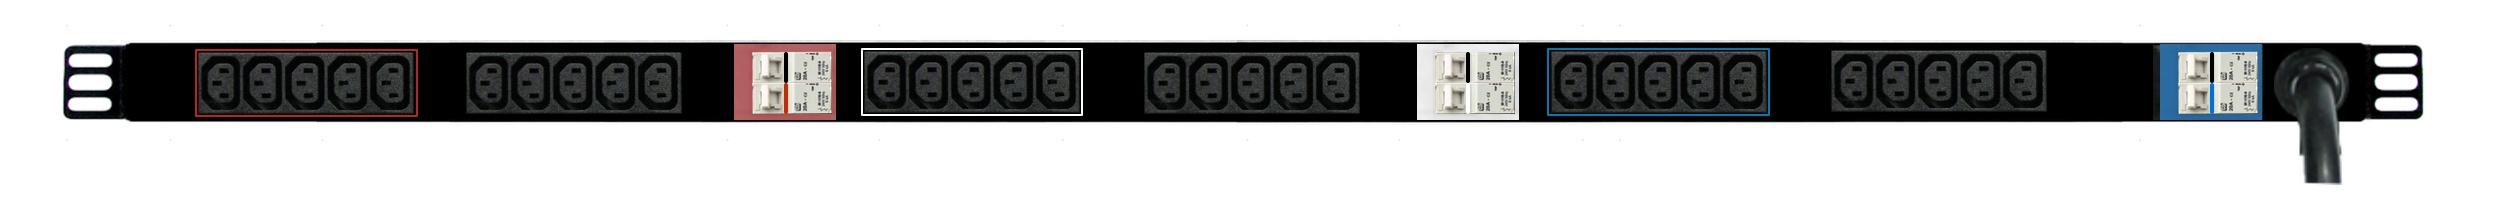 PDU - 3phase: Total 30x IEC C13 10A outlets, 0RU